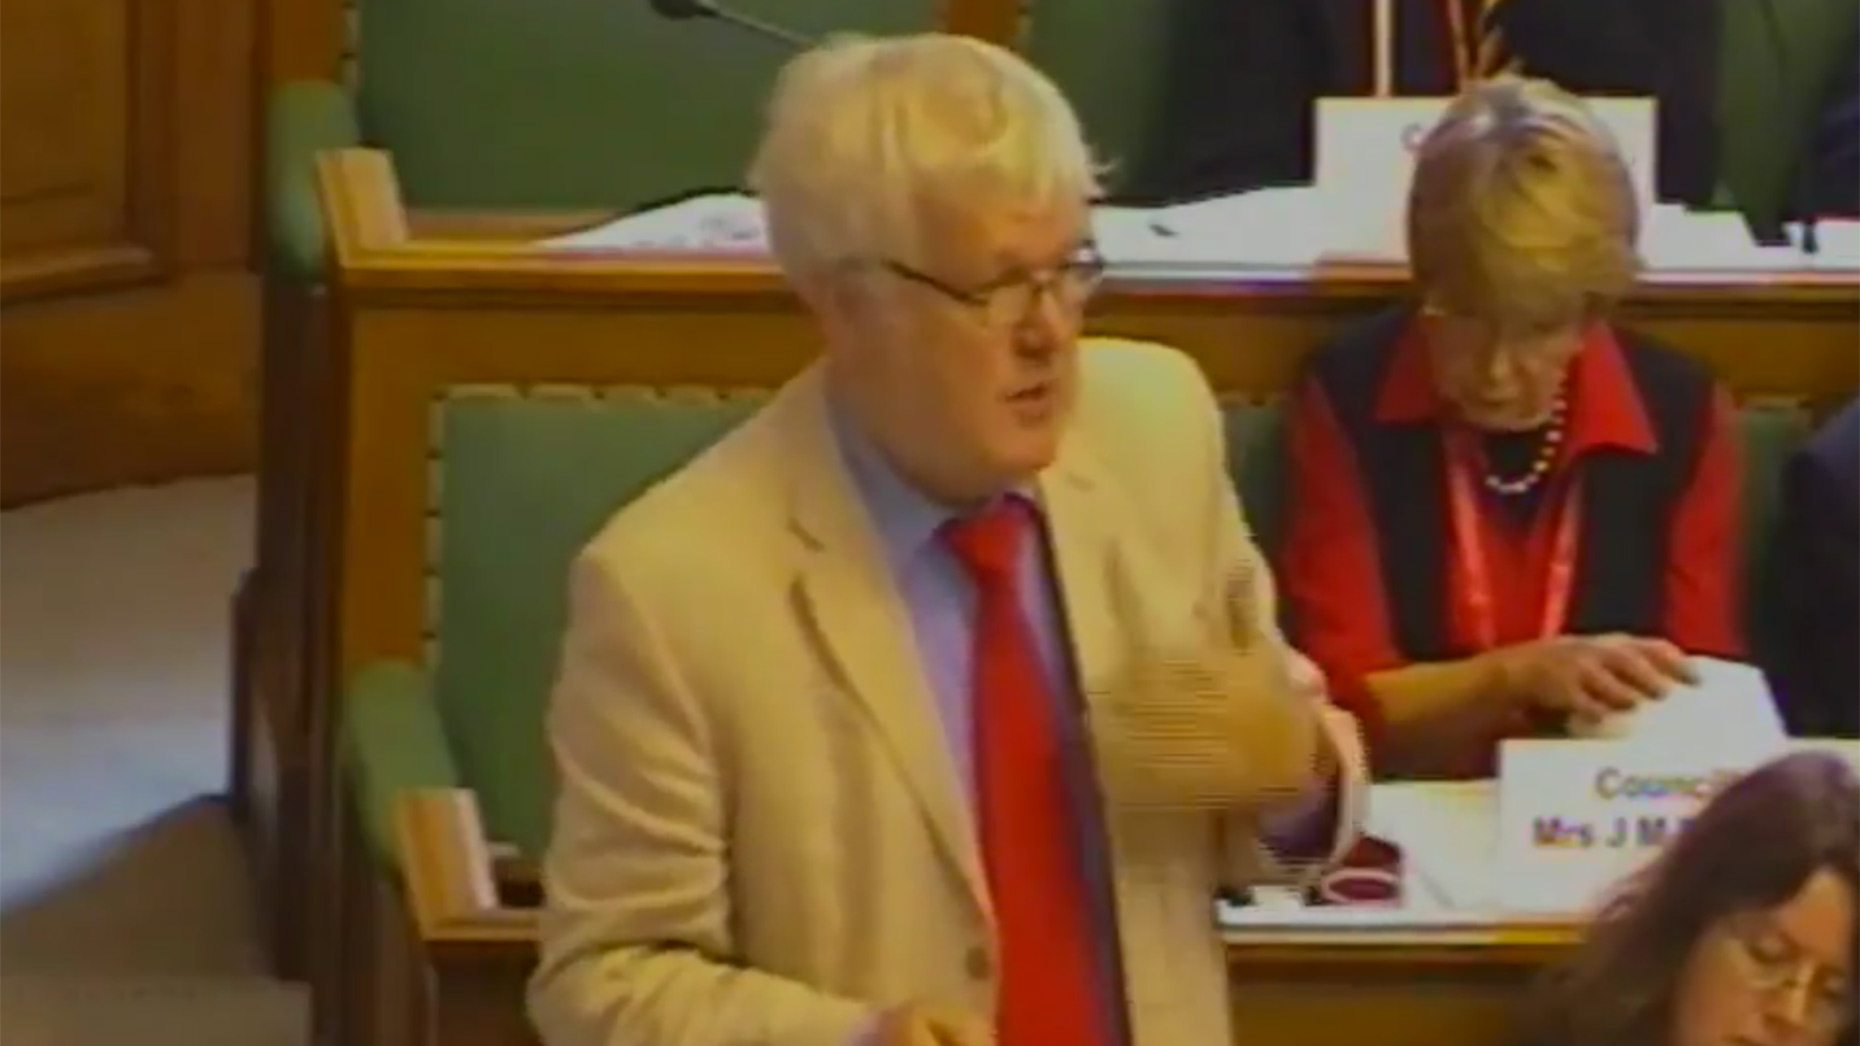 Councillor Phil Dilks